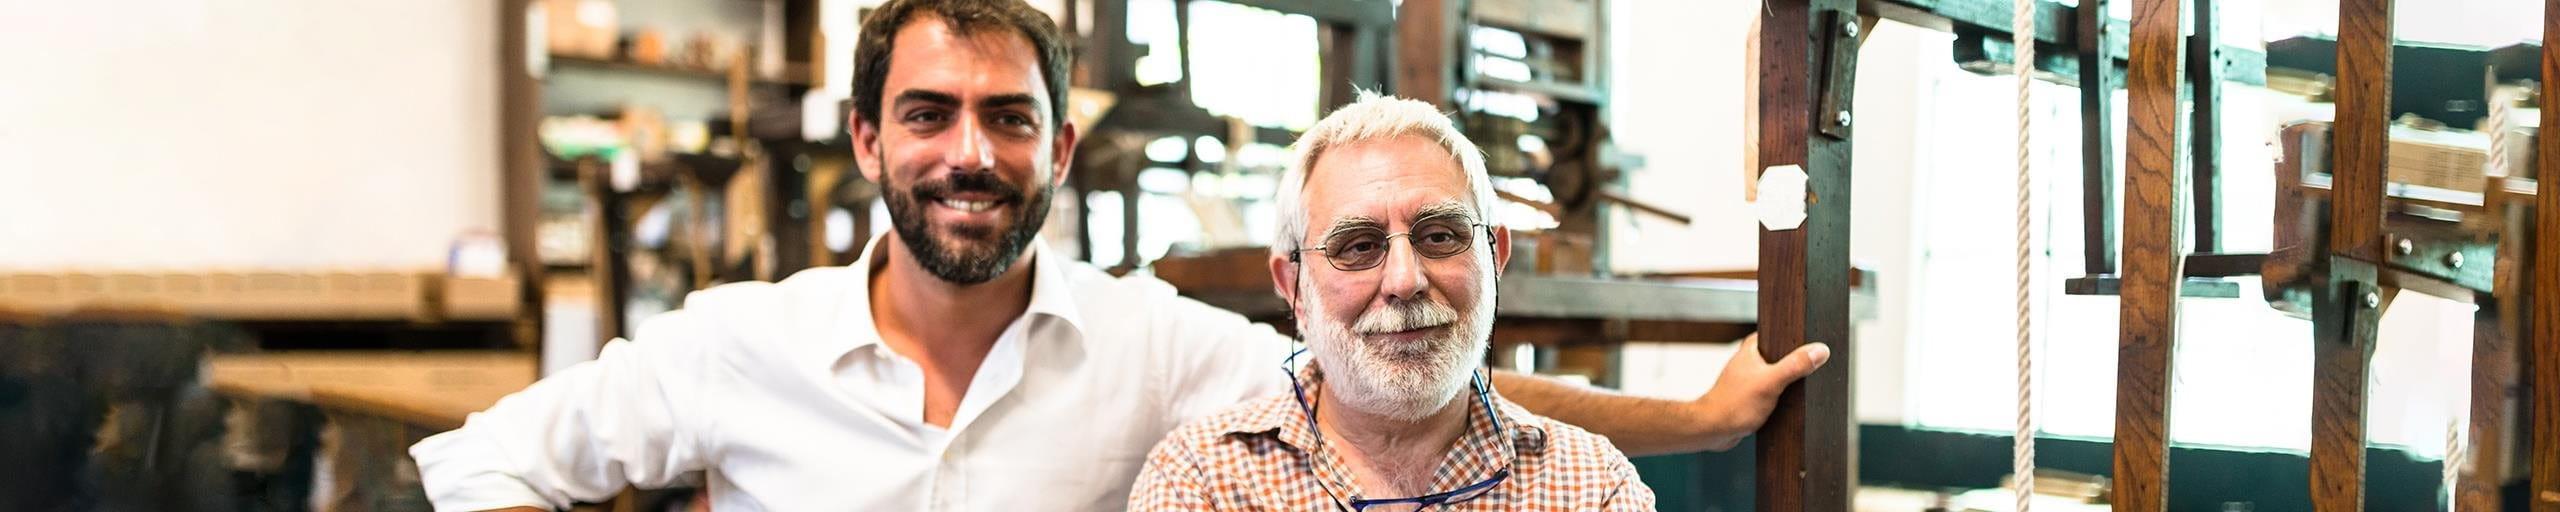 Portrait father & son in the company